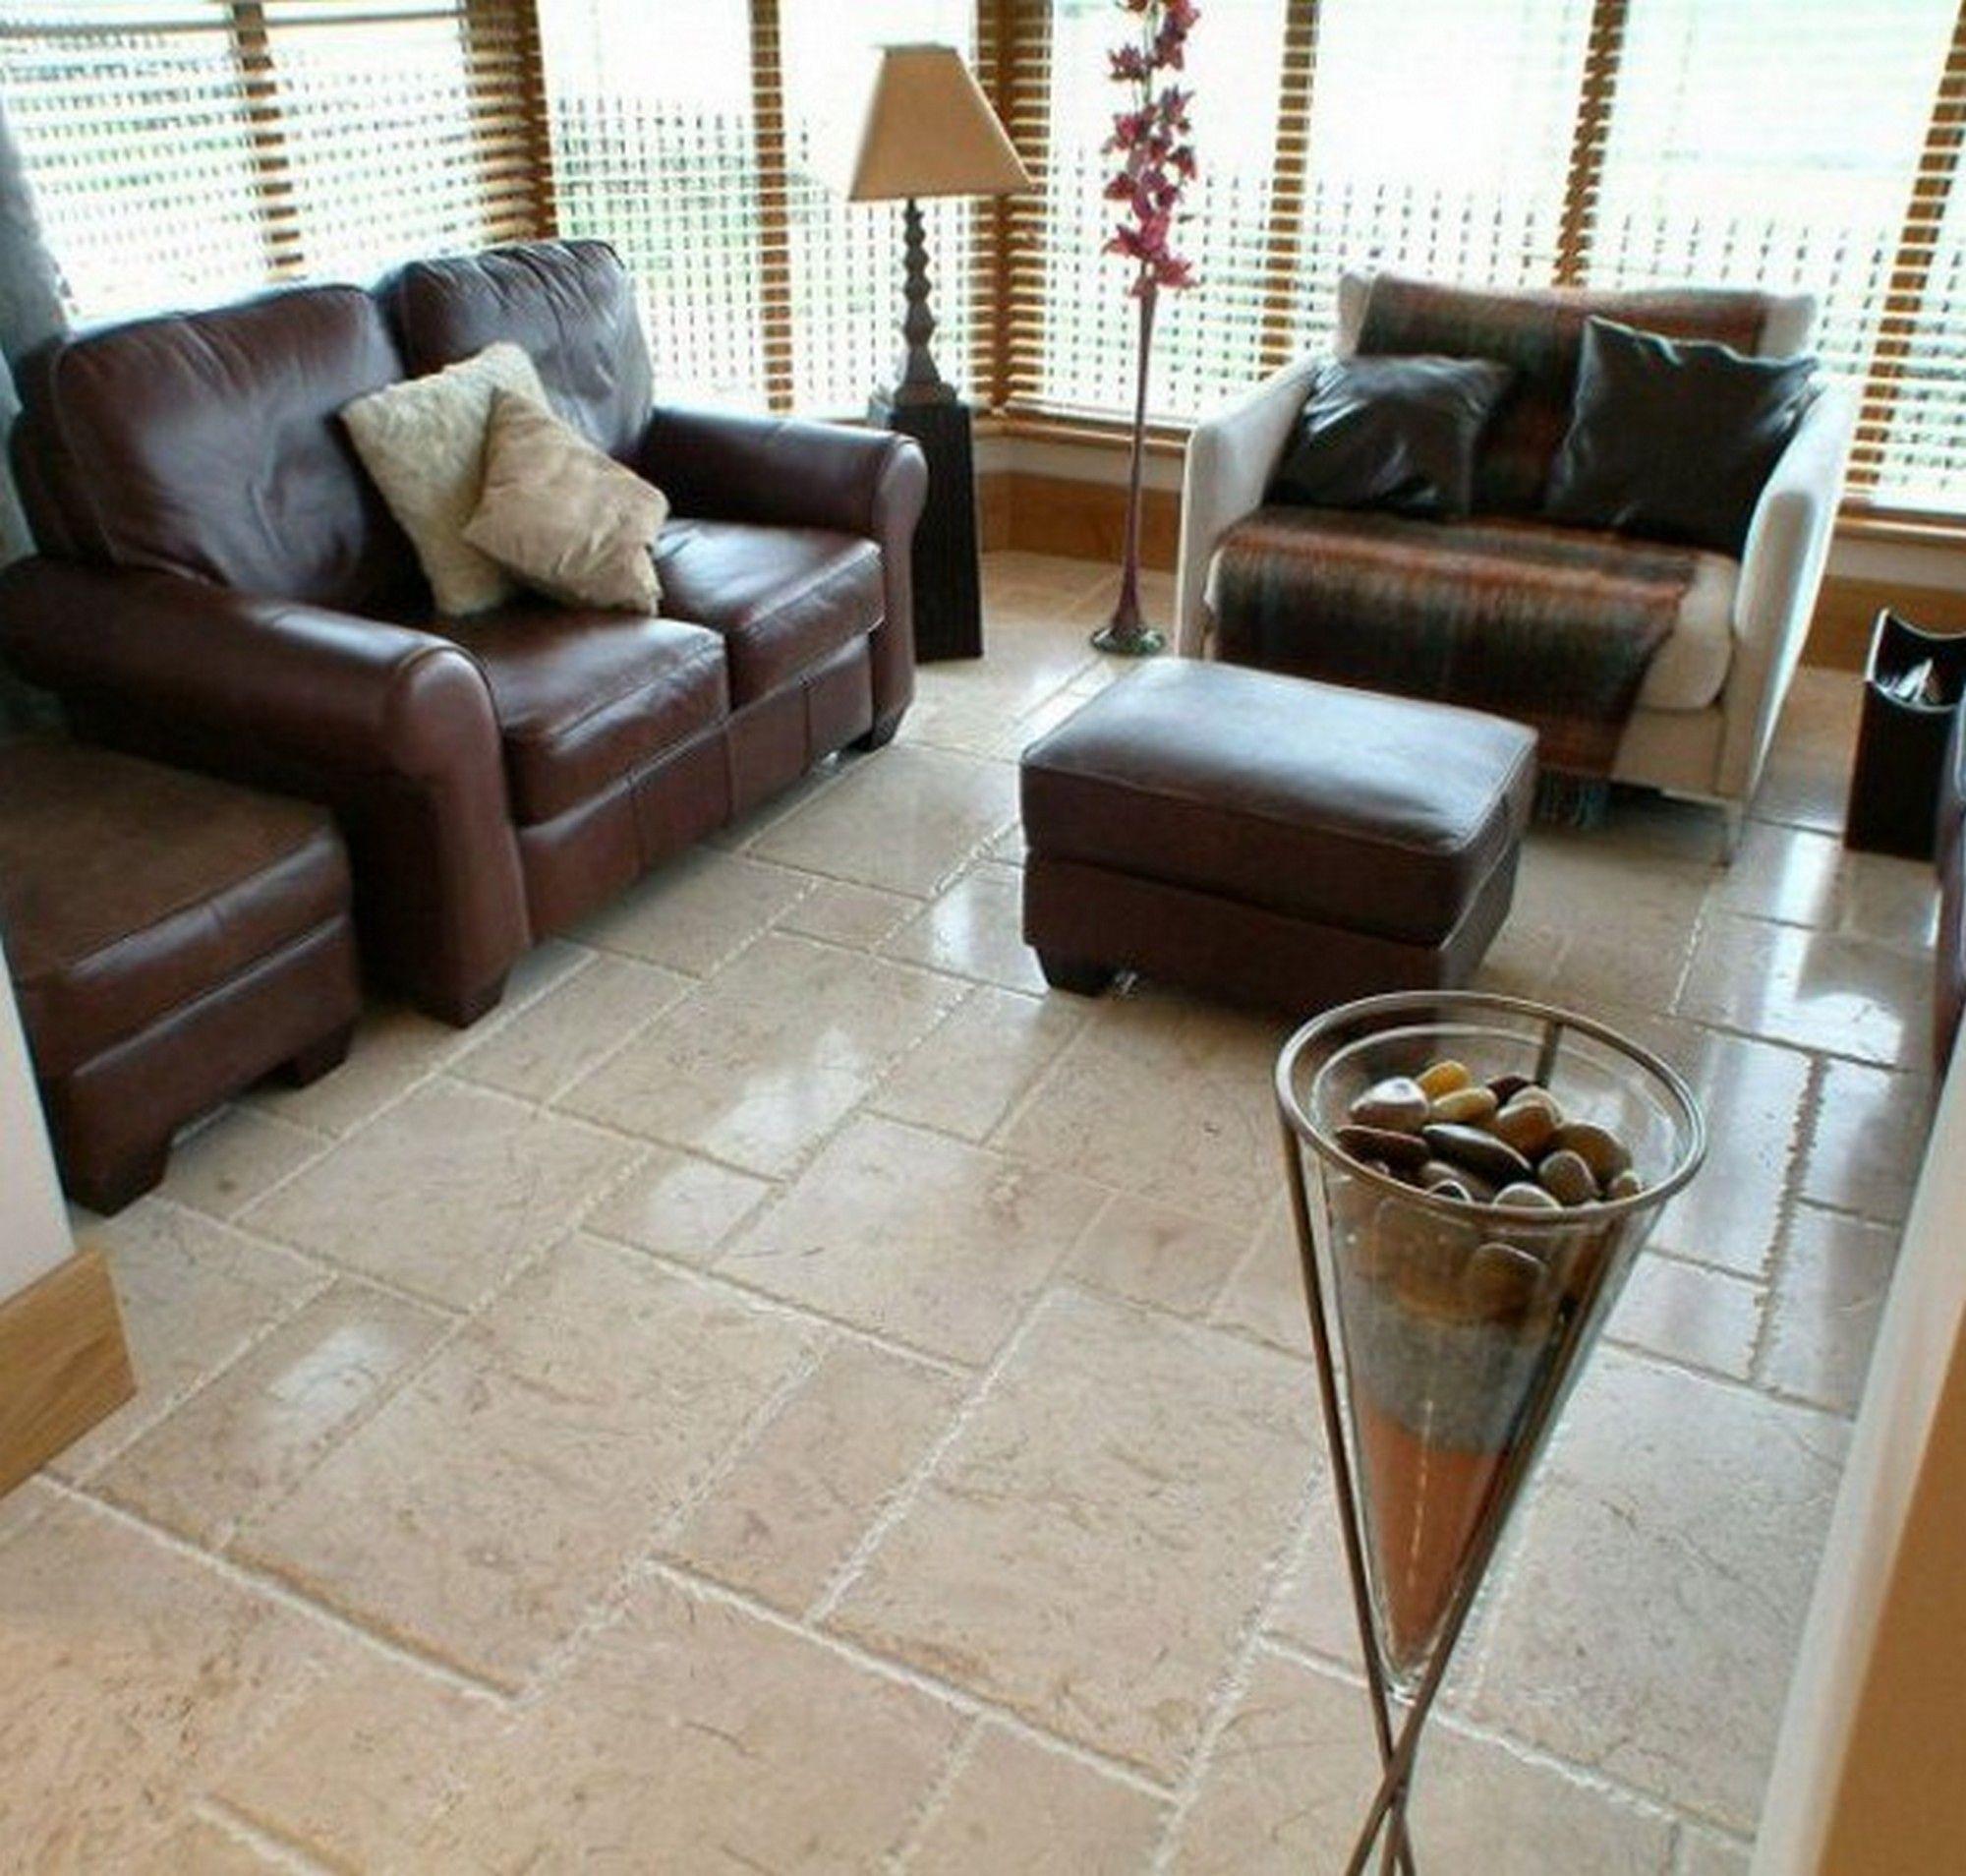 terrific-outoftheordinary-marble-floor-tile-for-living-room